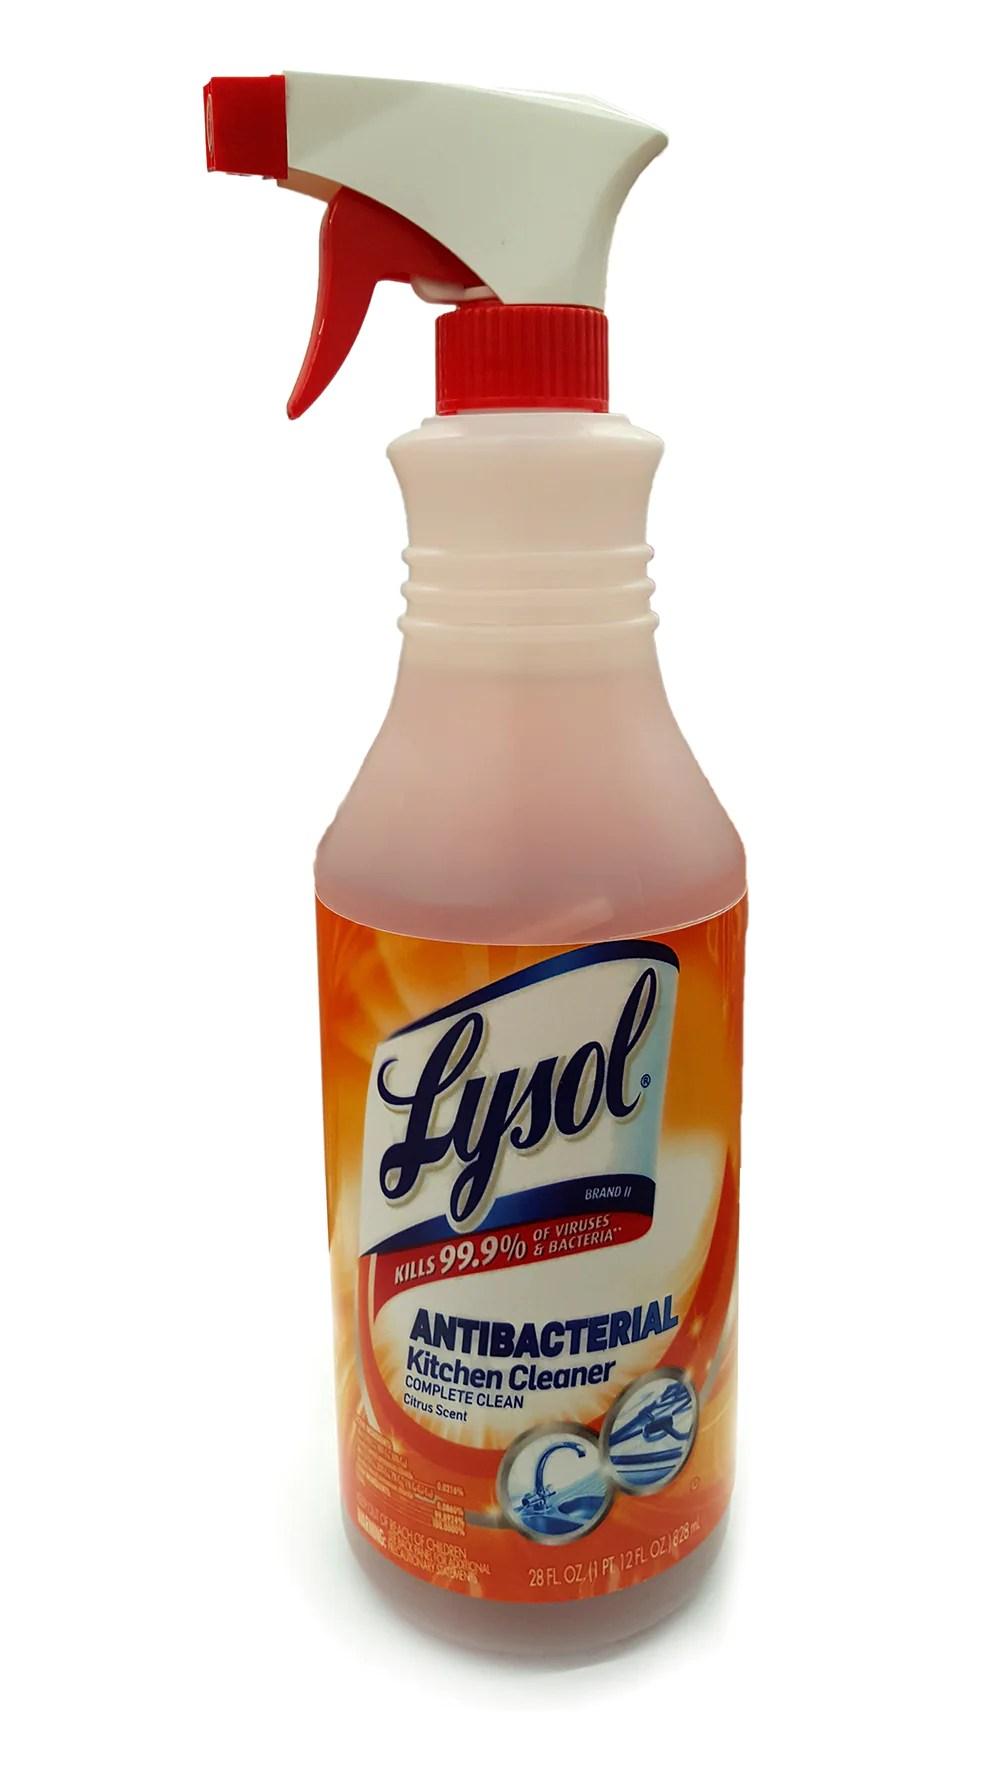 lysol antibacterial kitchen cleaner plate sets spray diversion safe working bottle